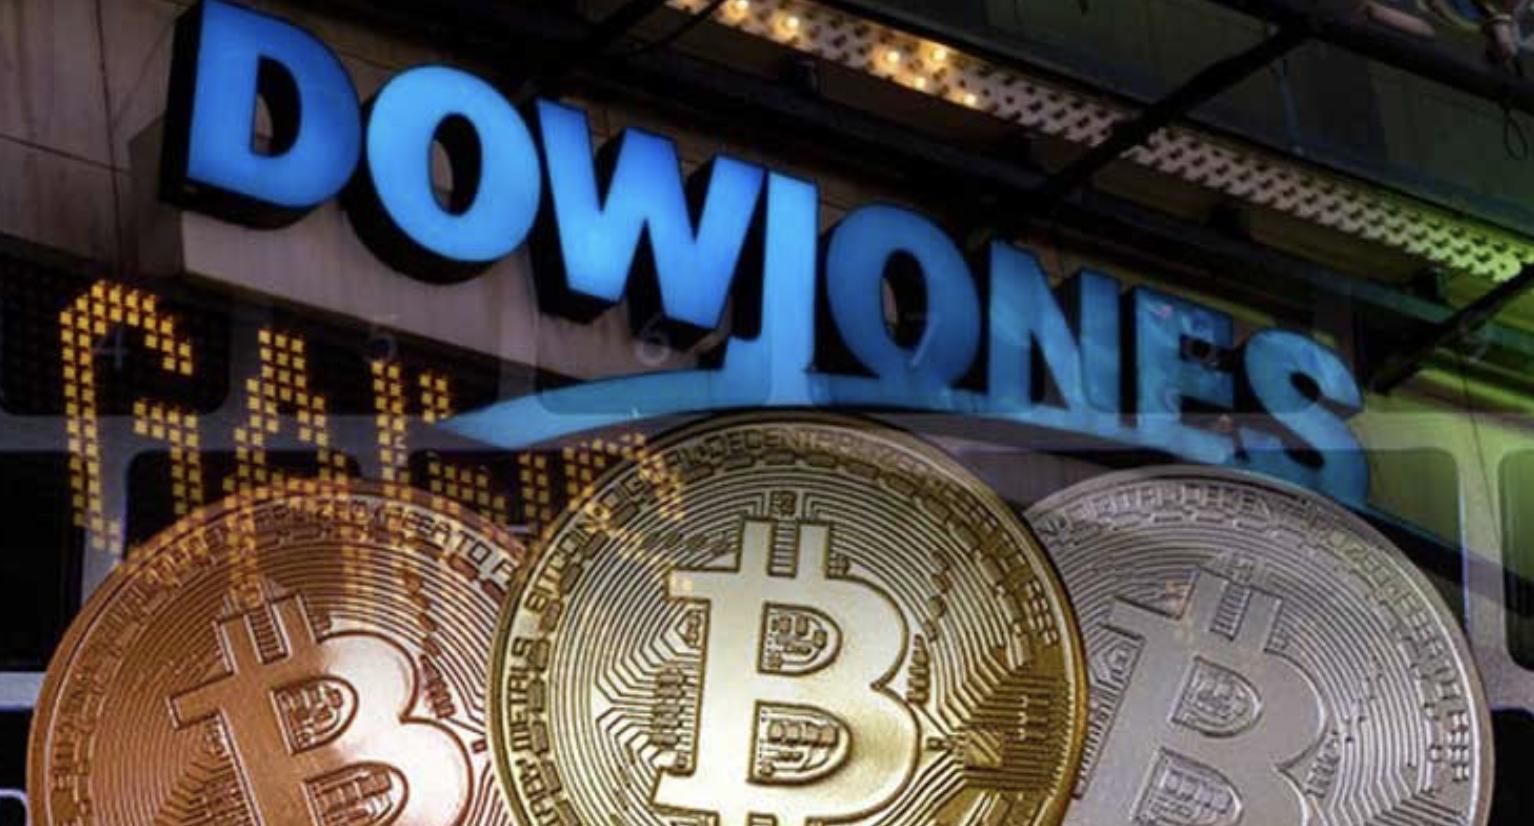 Dow jones bitcoin iliskisi